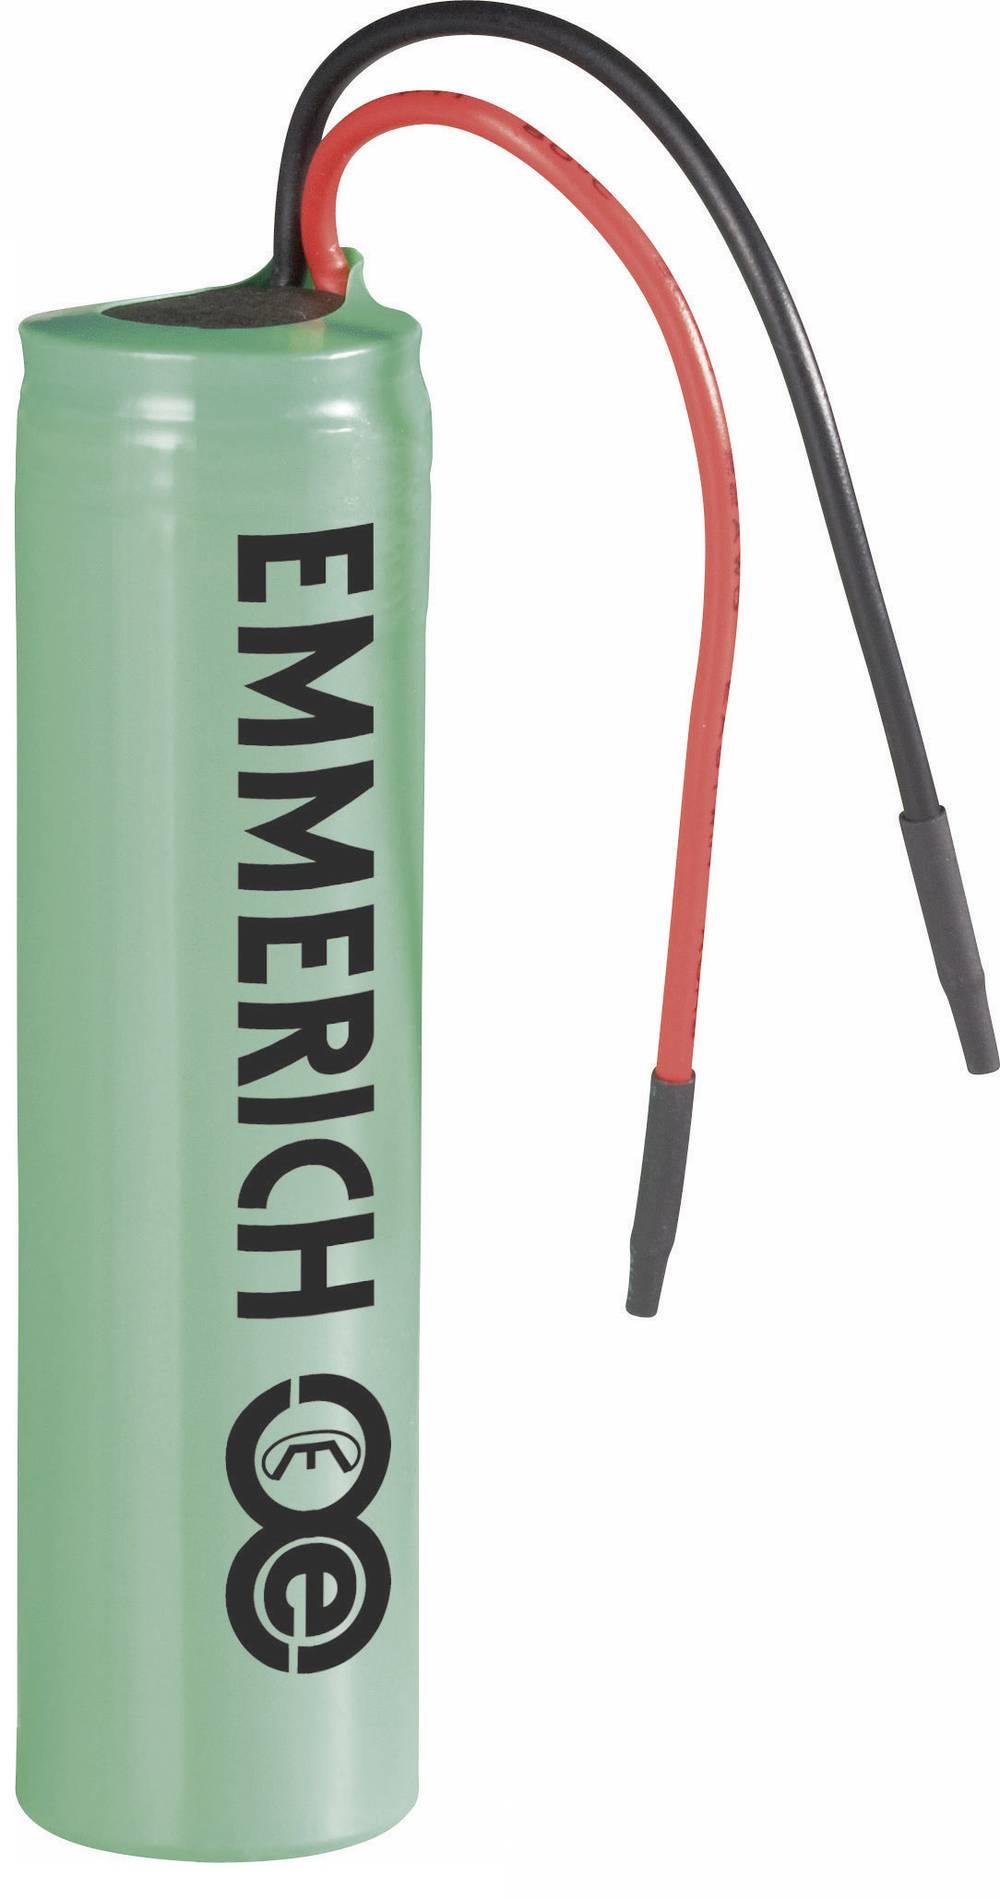 Litij-ionski akumulator s kablom 14500 Emmerich 3, 7 V, 800 mAh